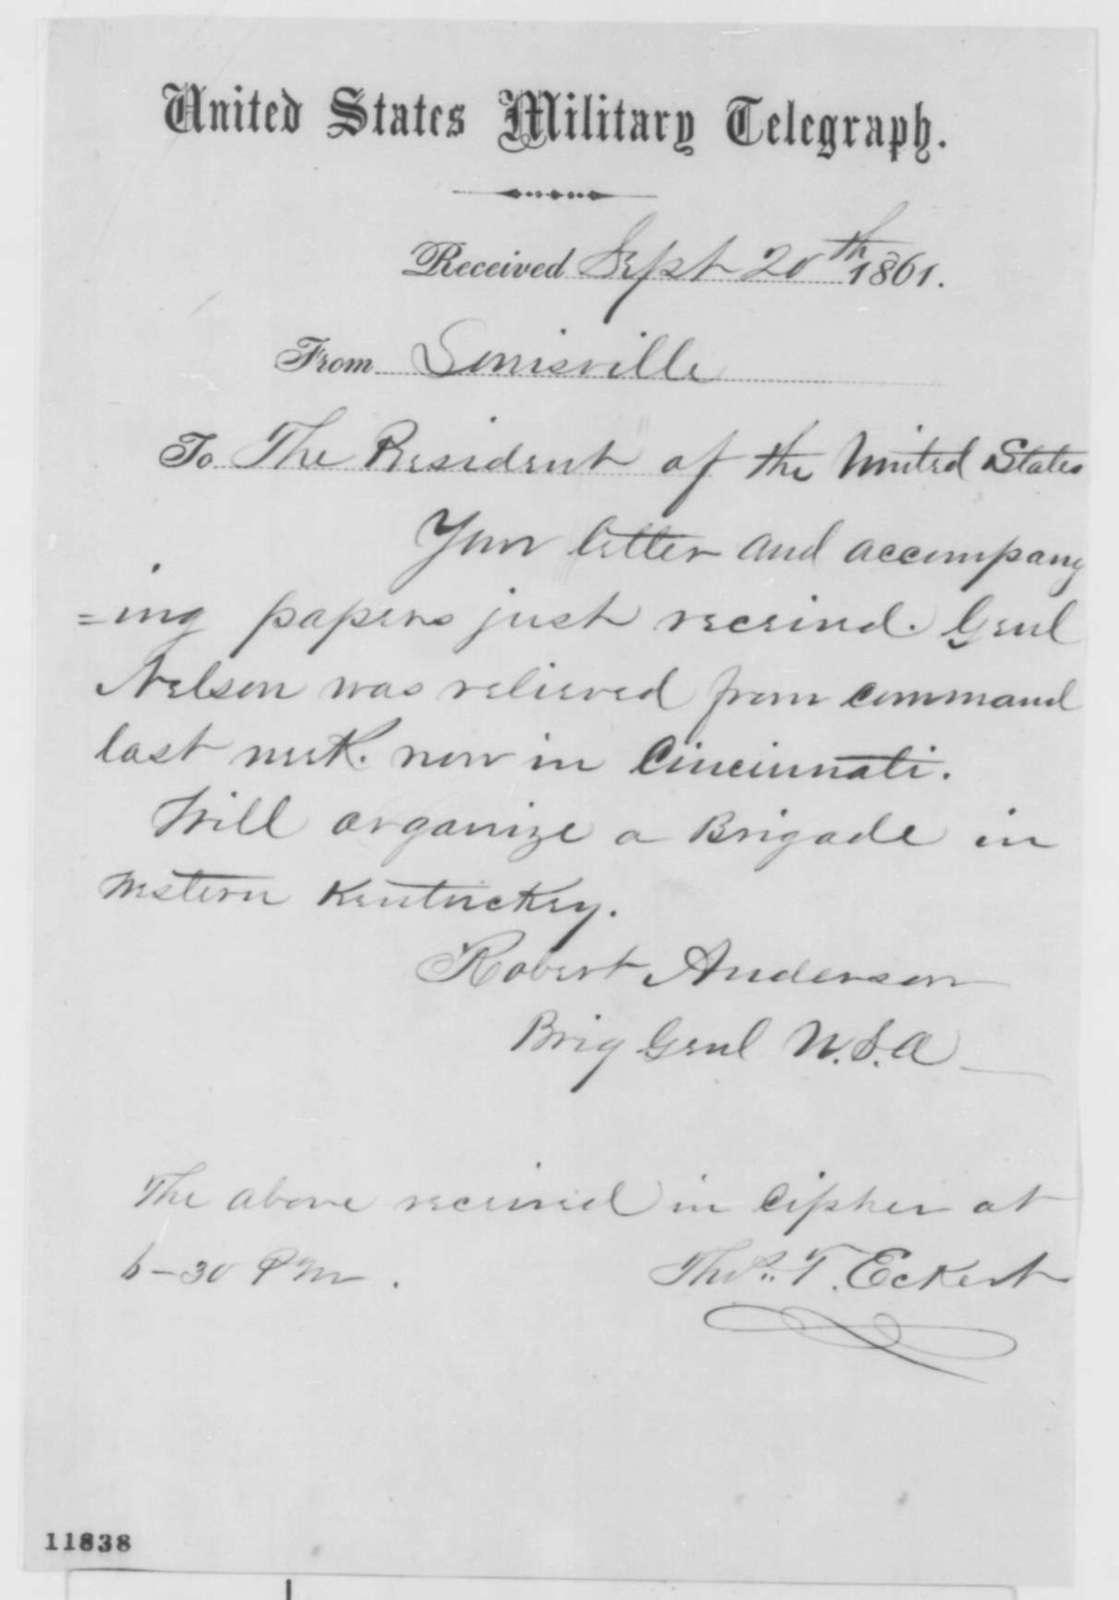 Robert Anderson to Abraham Lincoln, Friday, September 20, 1861  (Telegram acknowledging receipt of letter)